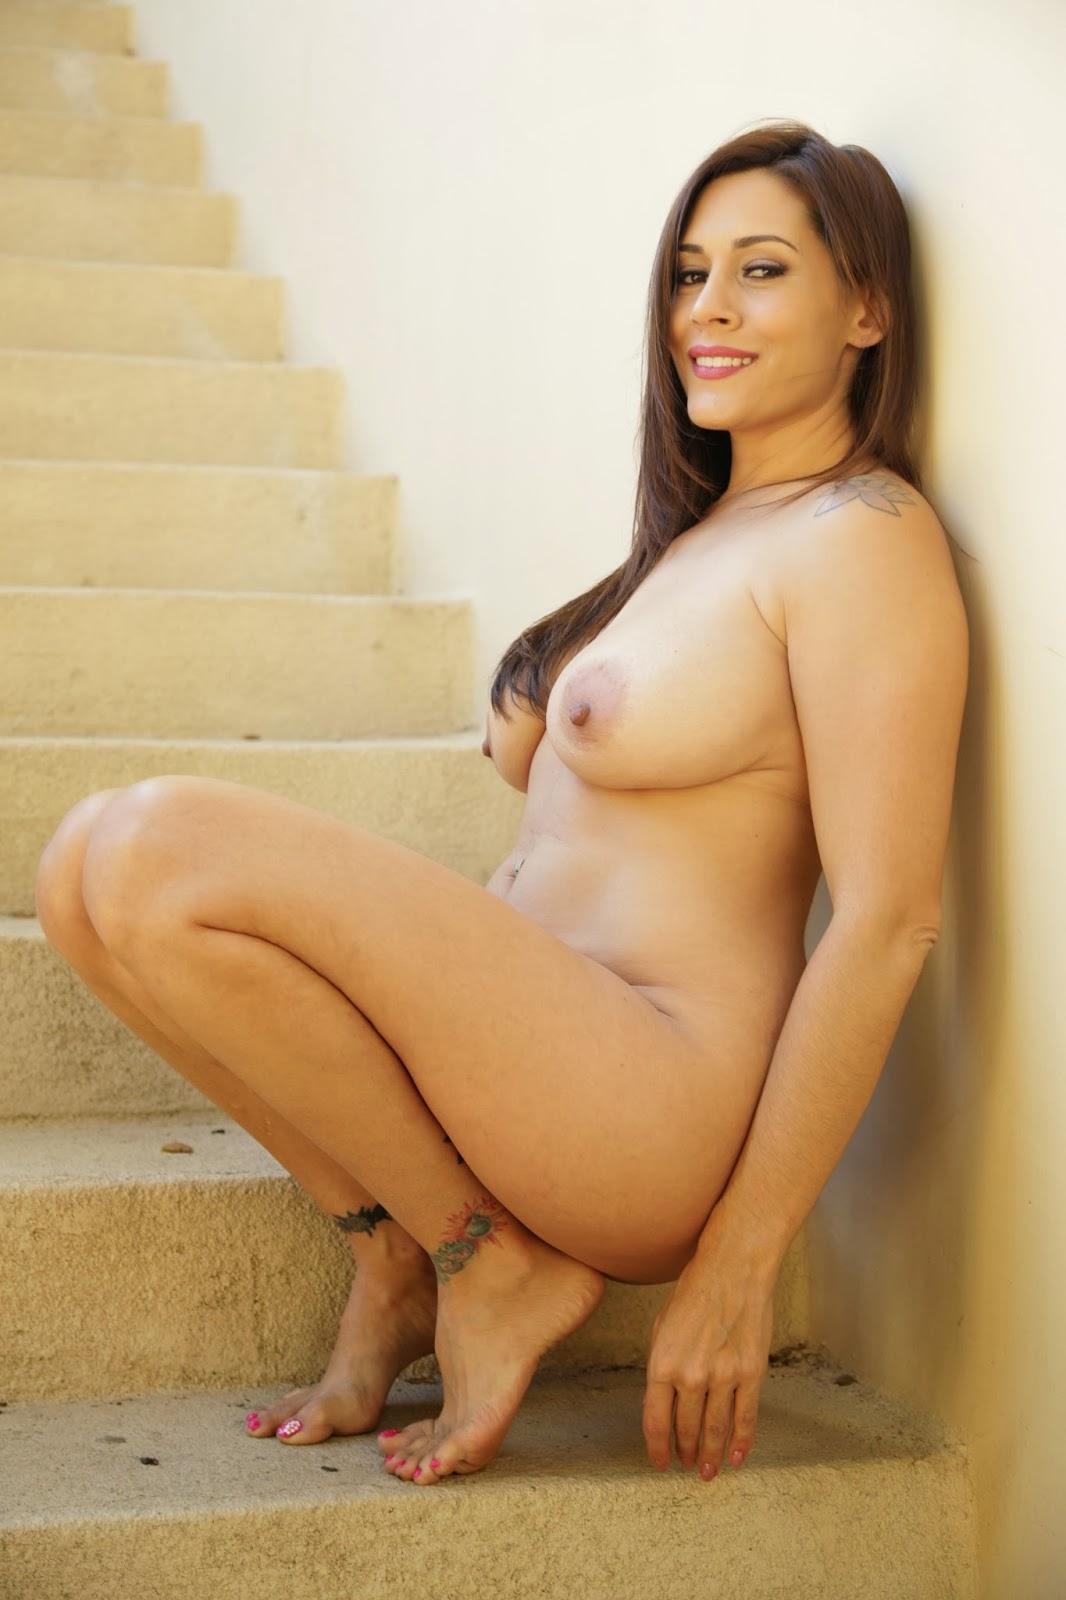 Bianci cute latina milf nude pussy